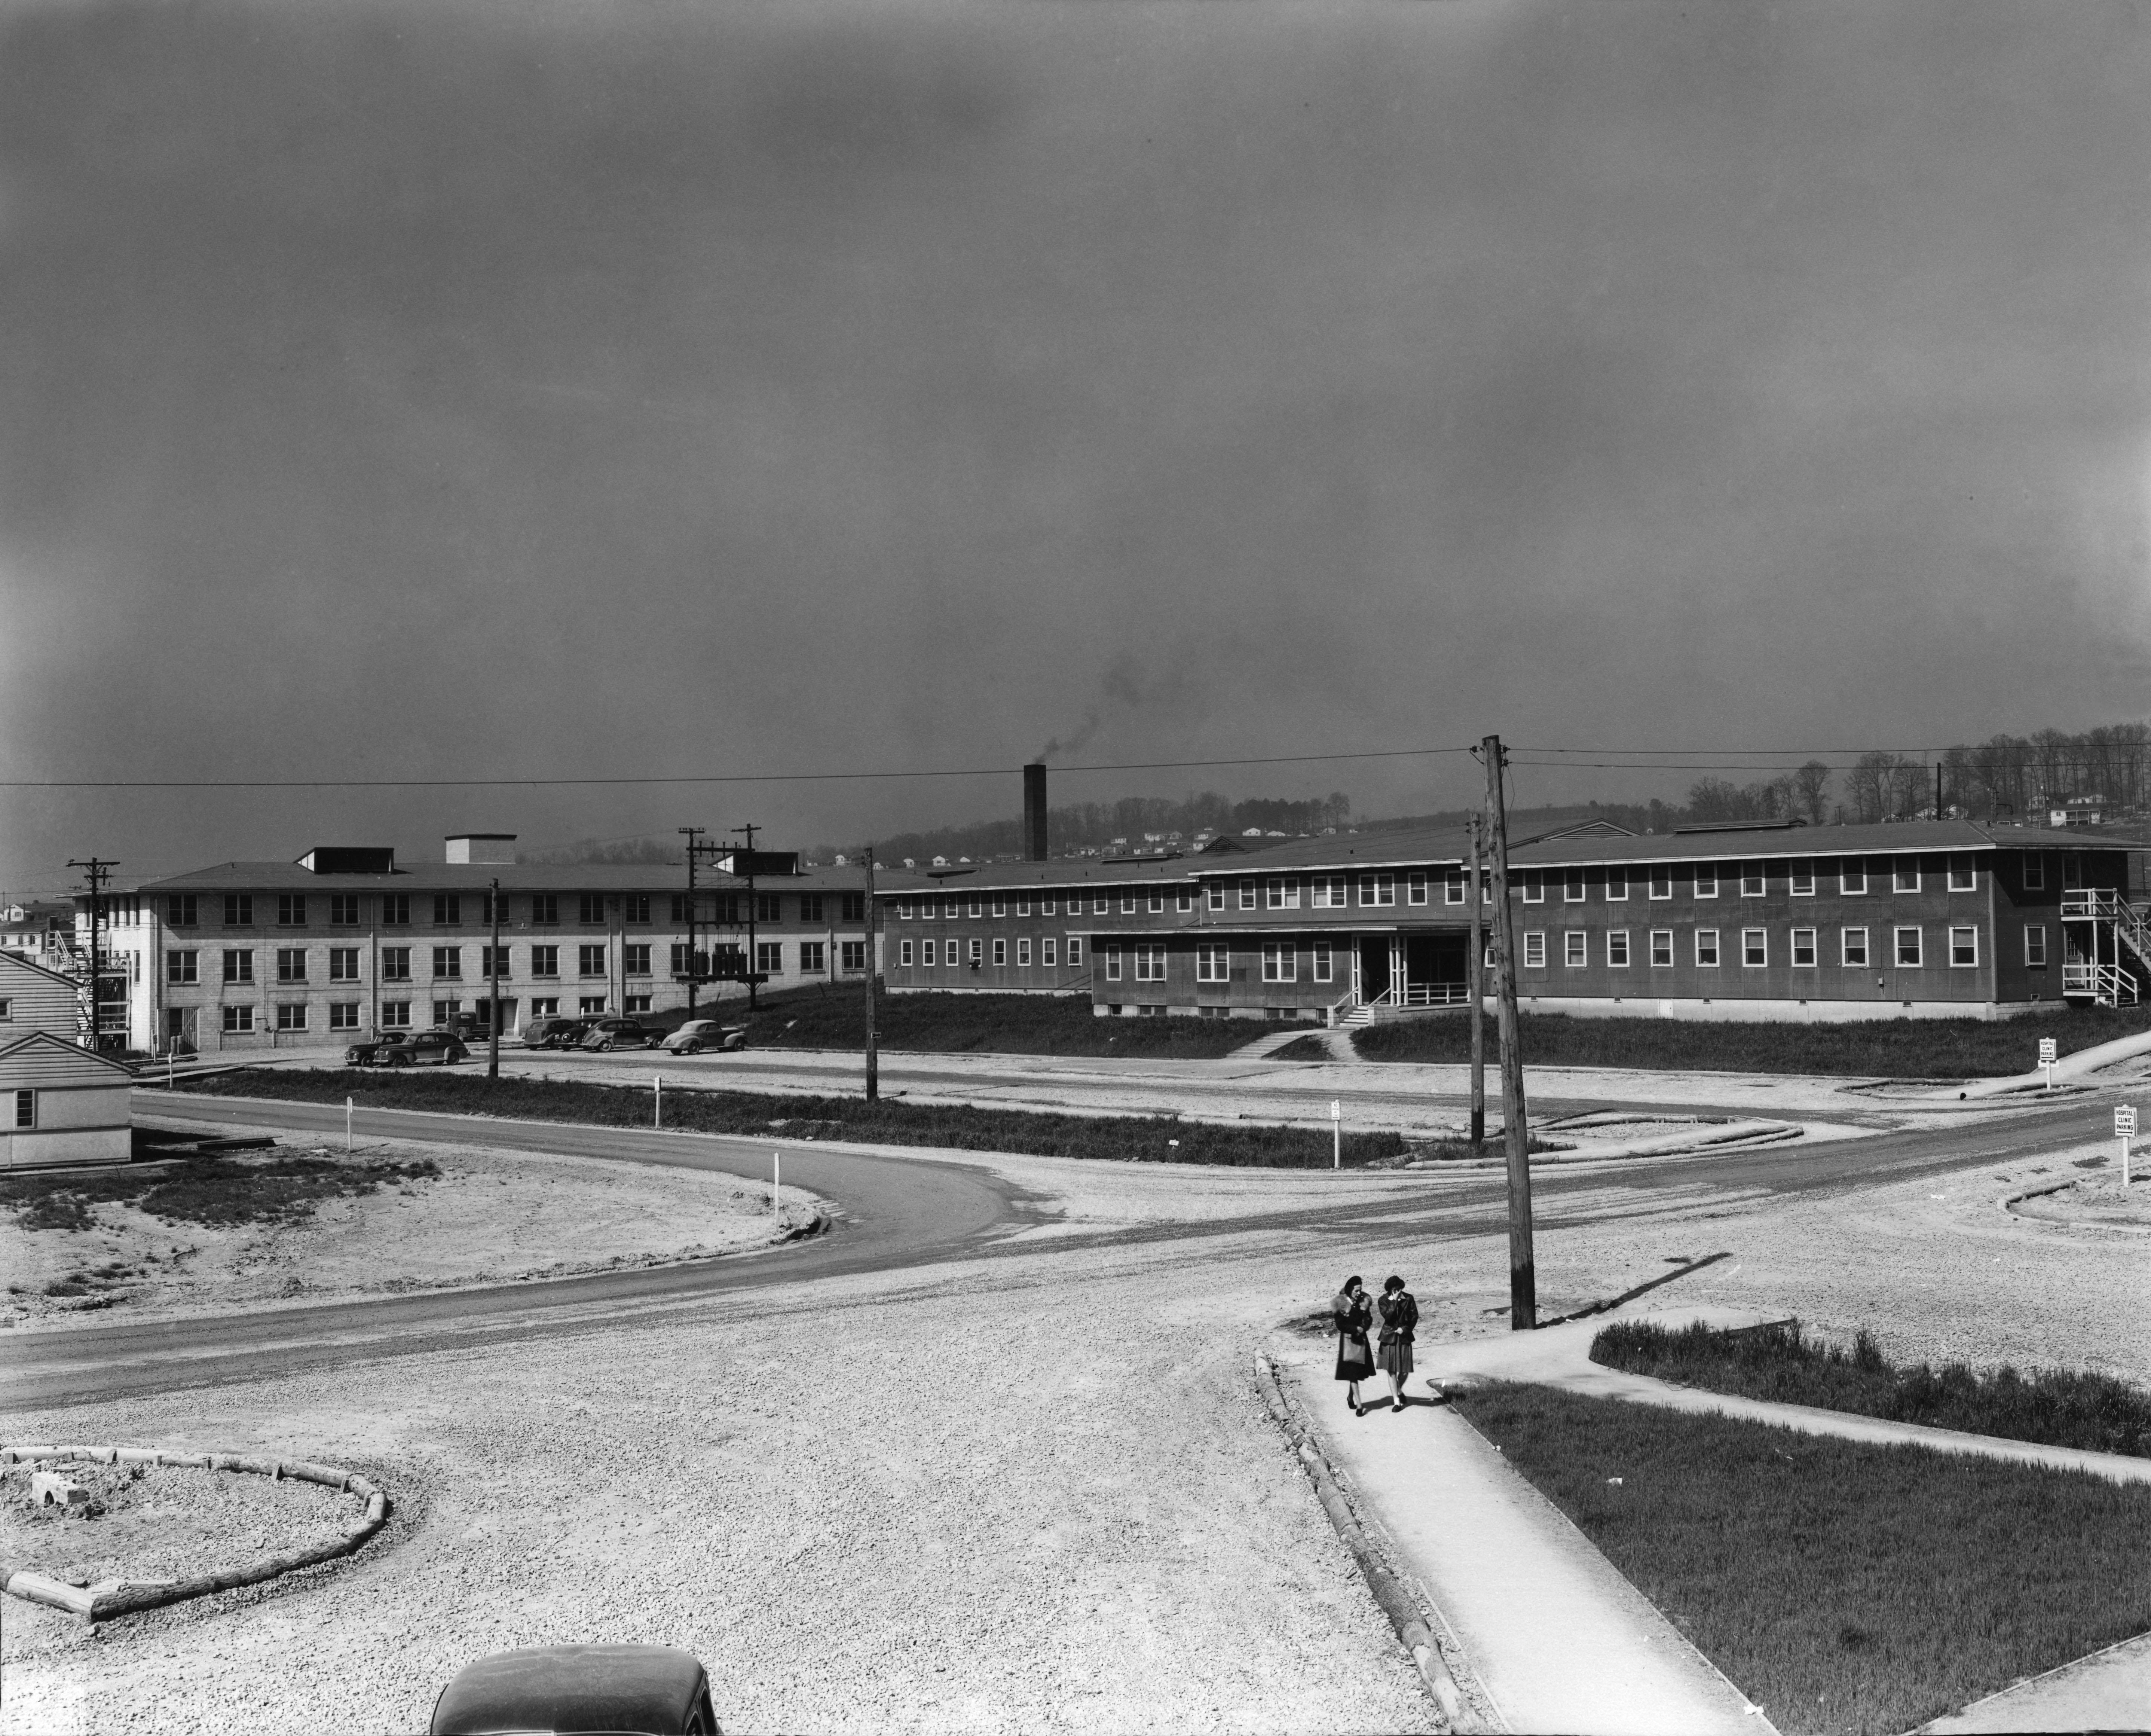 File:C E W  Hospital Oak Ridge (7900130404) jpg - Wikimedia